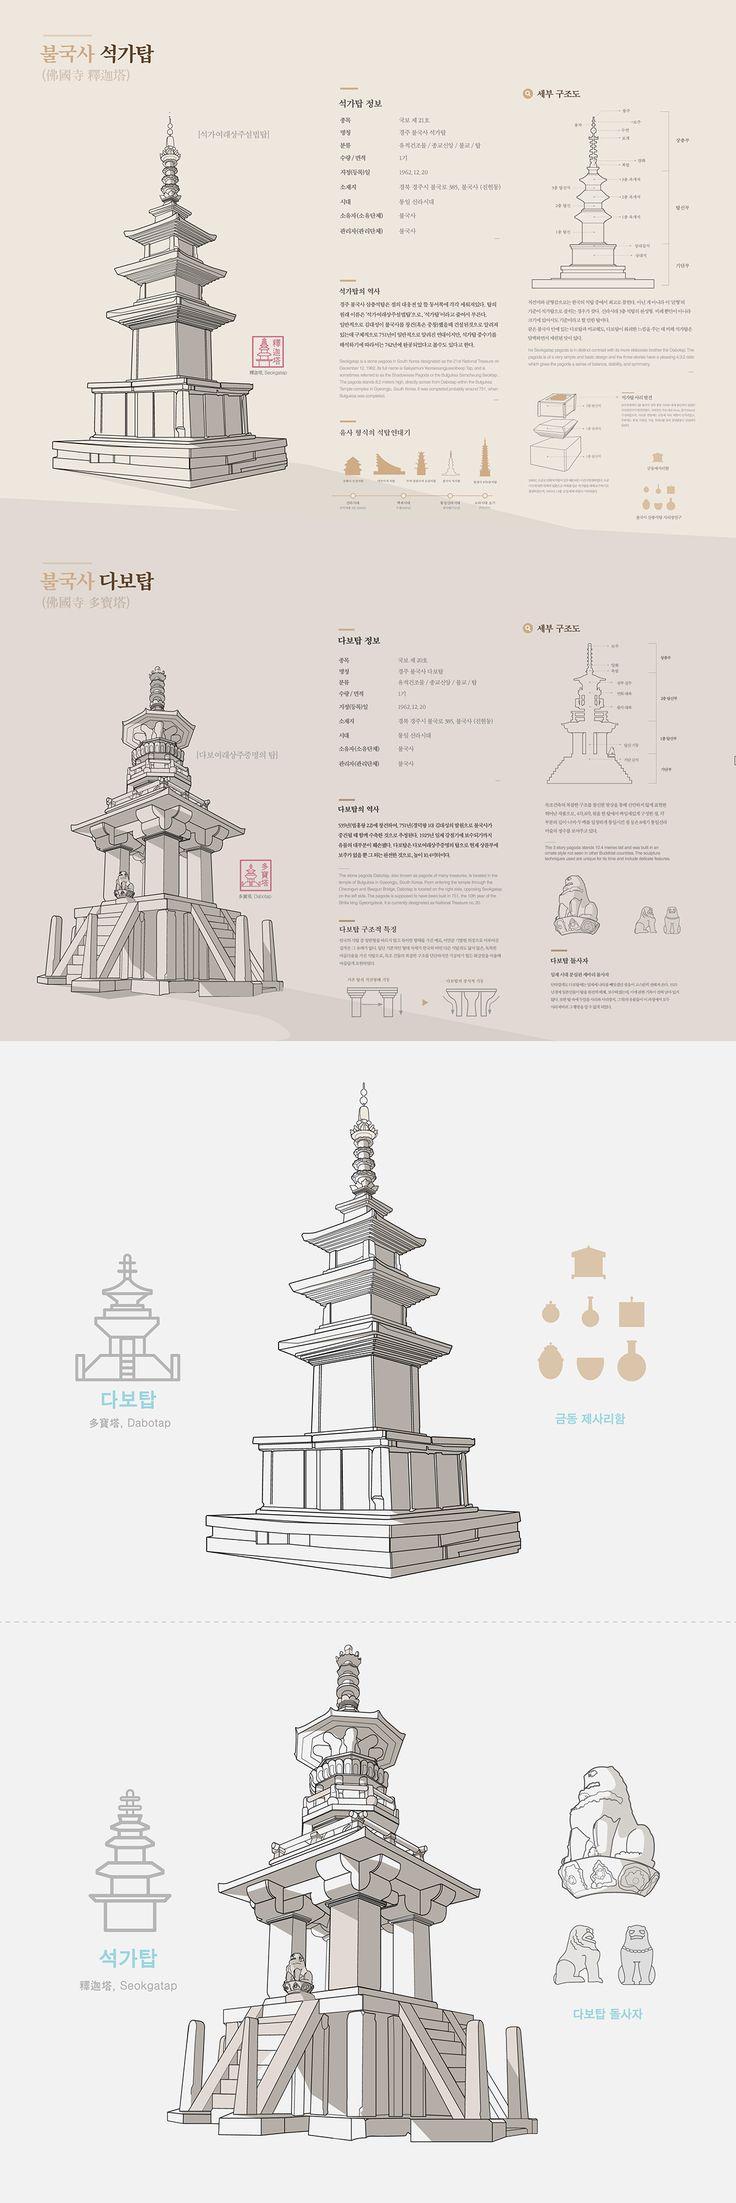 Choi Hyung Jin│ Information Design 2015│ Major in Digital Media Design │#hicoda │hicoda.hongik.ac.kr